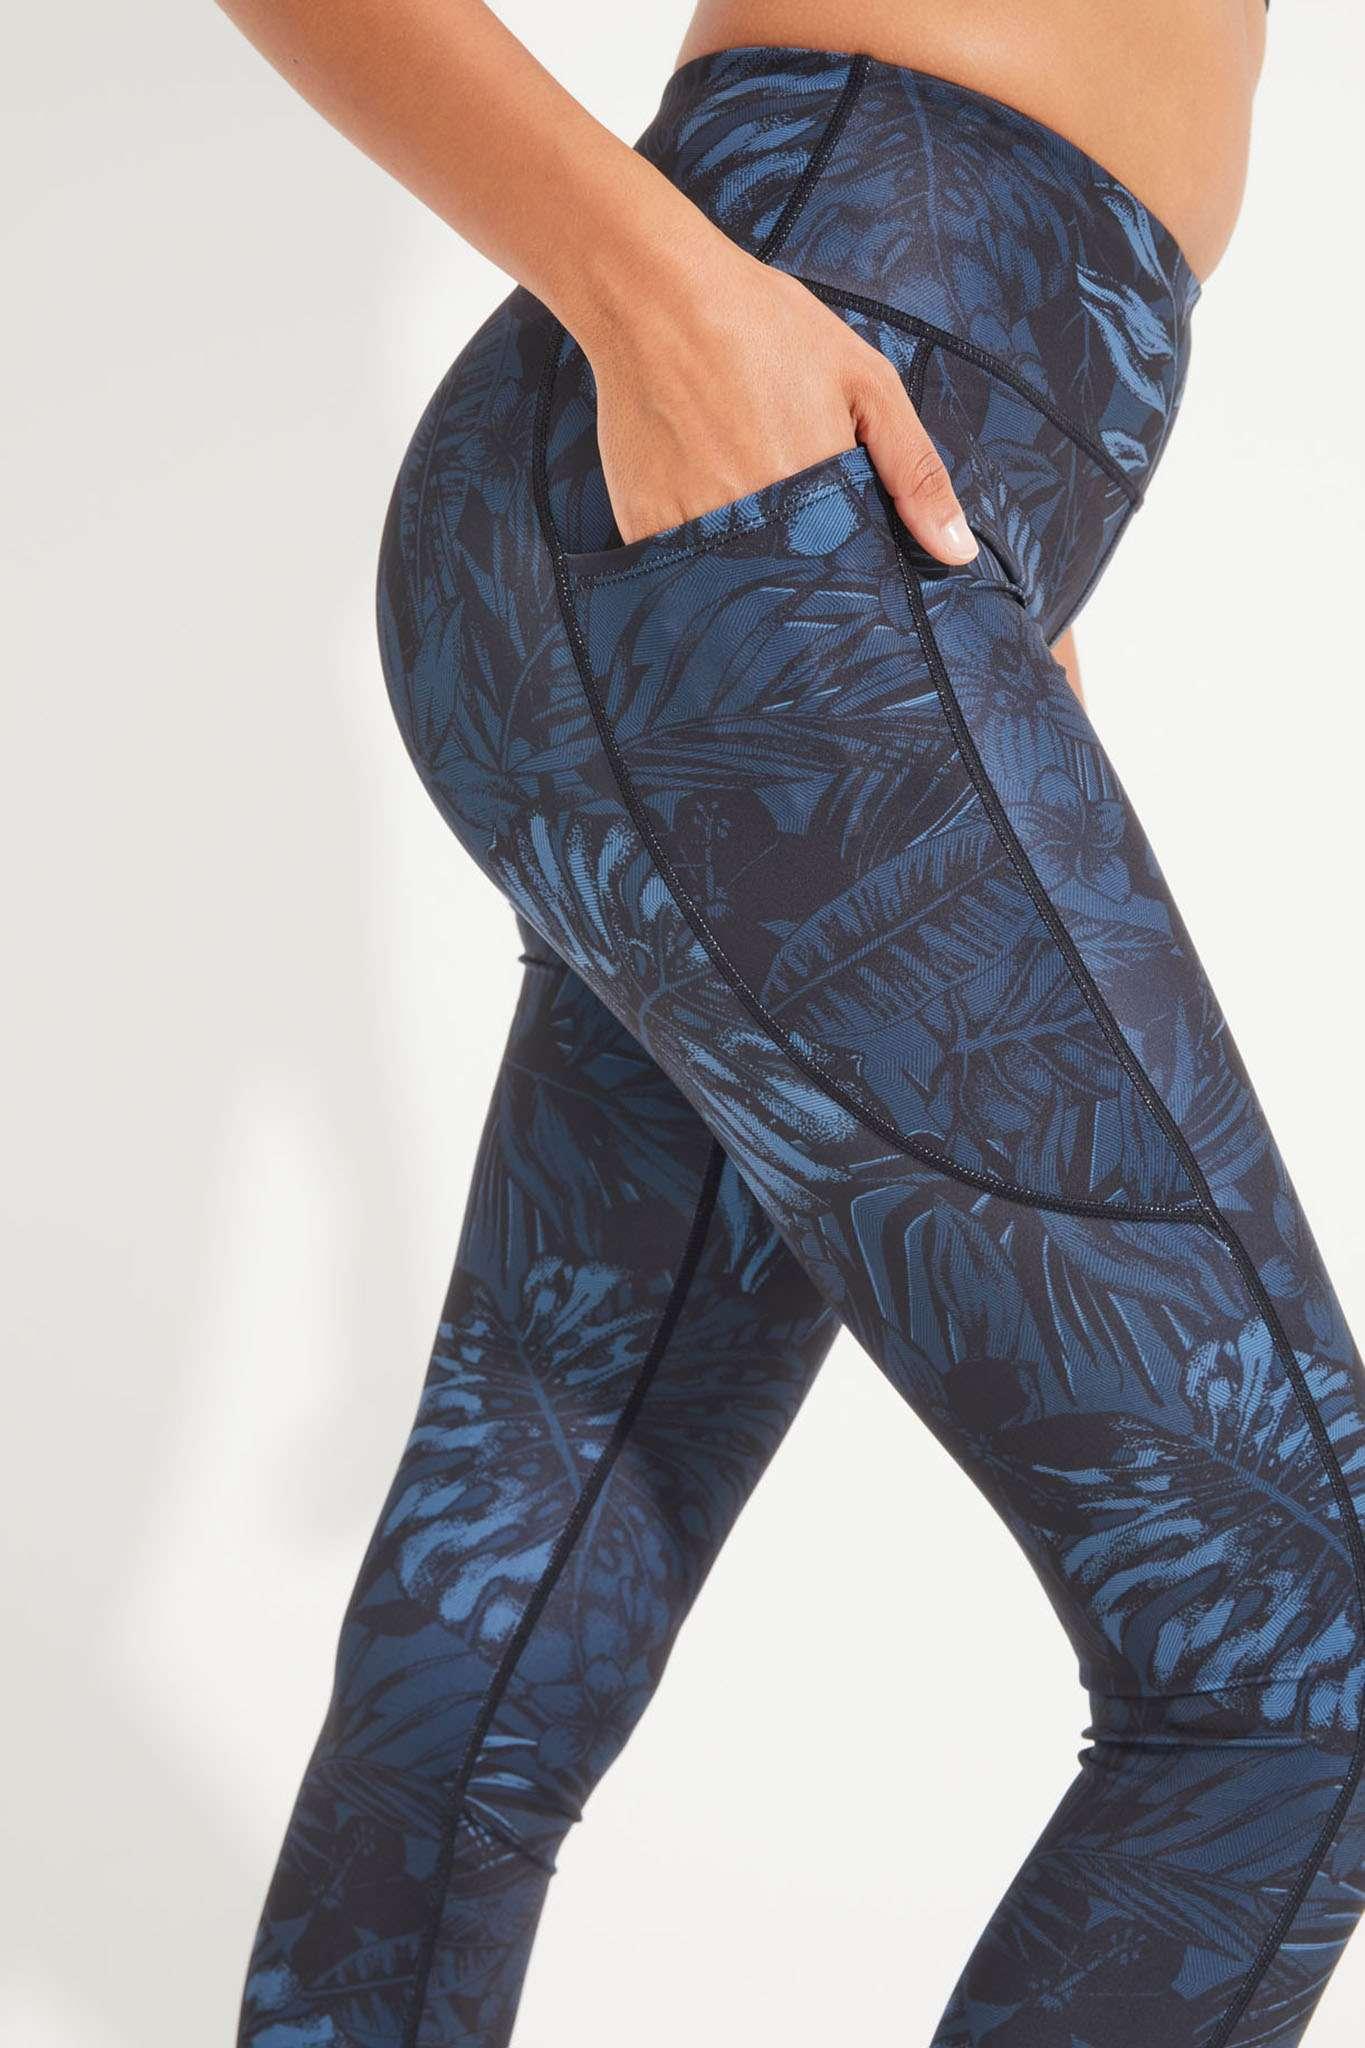 Dharma Bums Bondi Pocket RECYCLED midi eco Yoga Leggings - Oasis